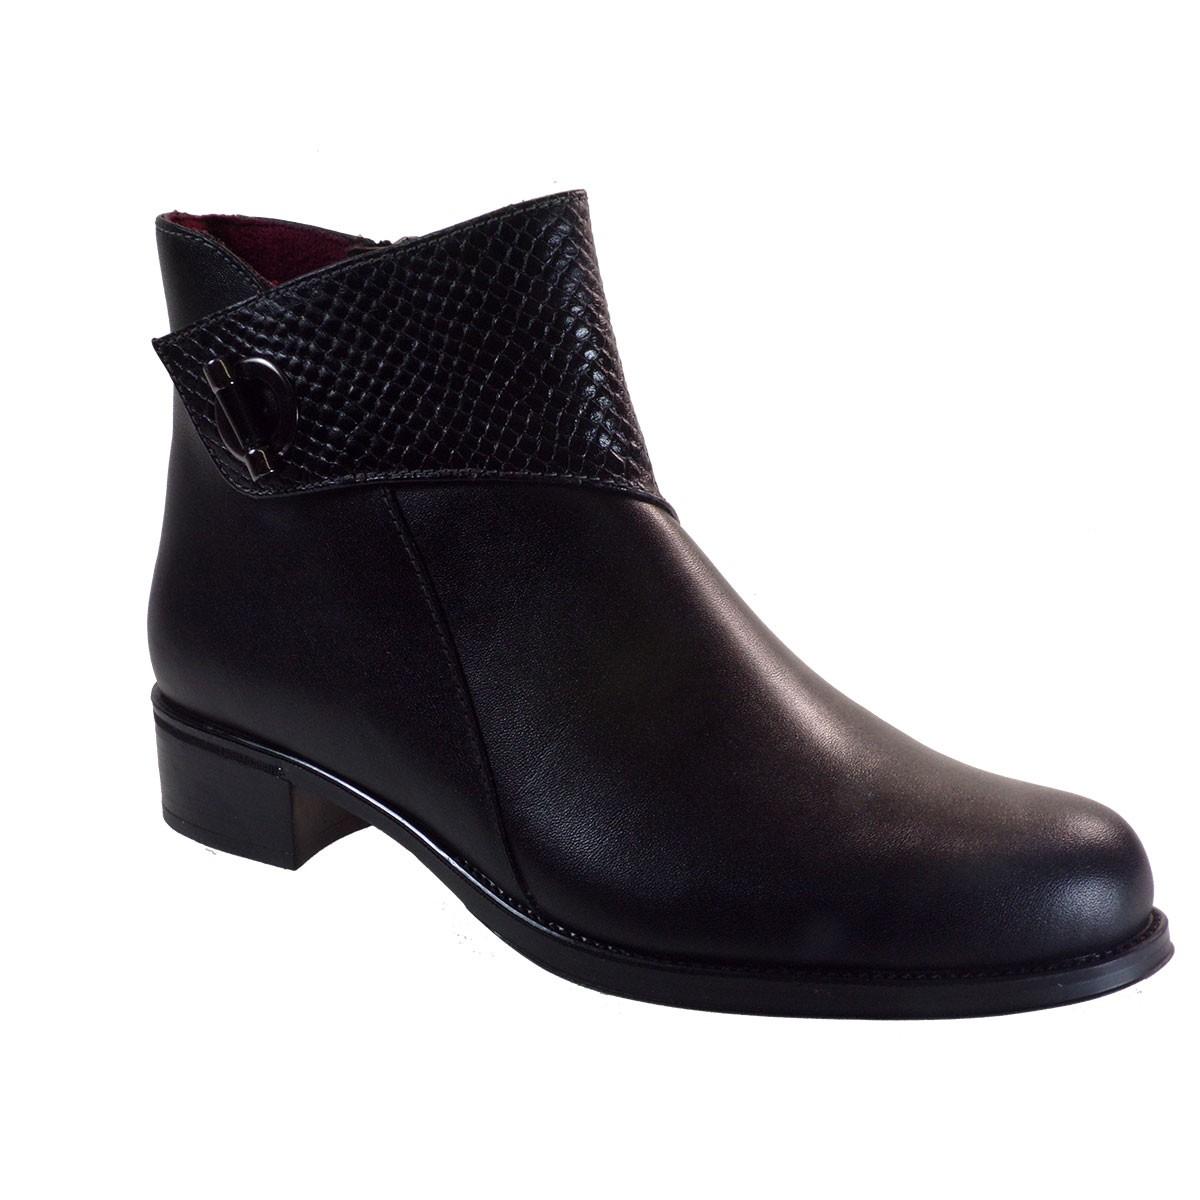 Softies Shoes Γυναικείες Μποτάκια 7250 Μαύρο Δέρμα